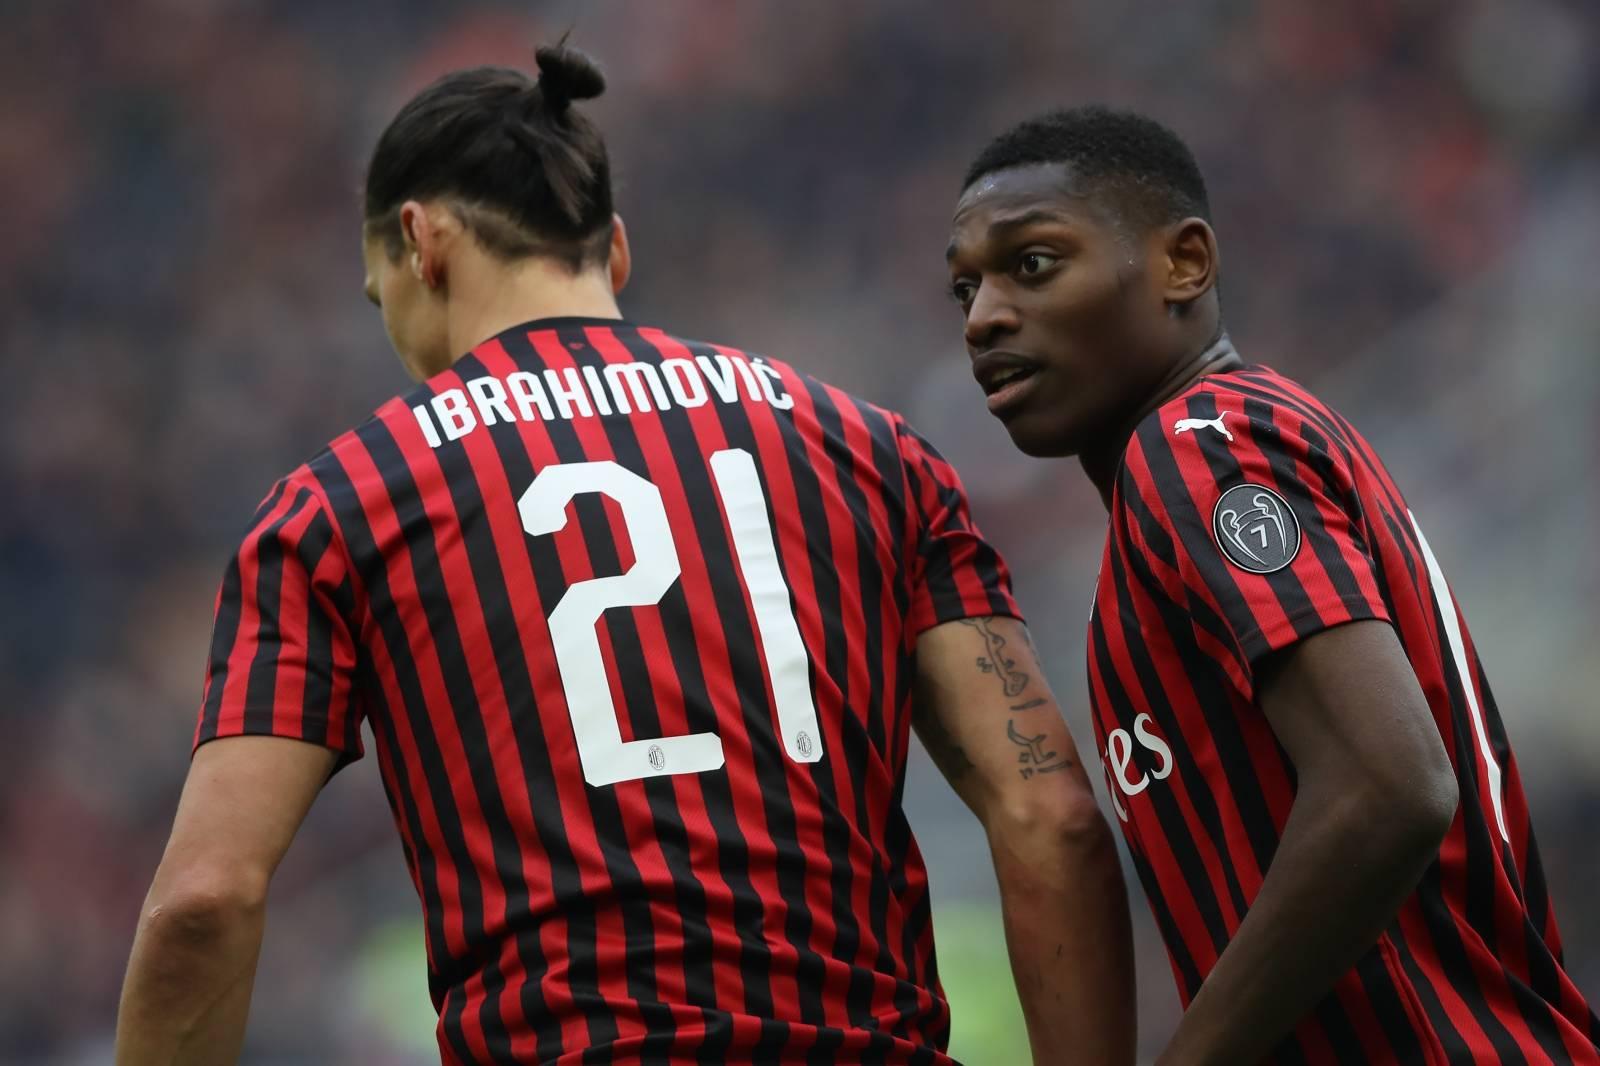 AC Milan v Udinese - Serie A - Giuseppe Meazza